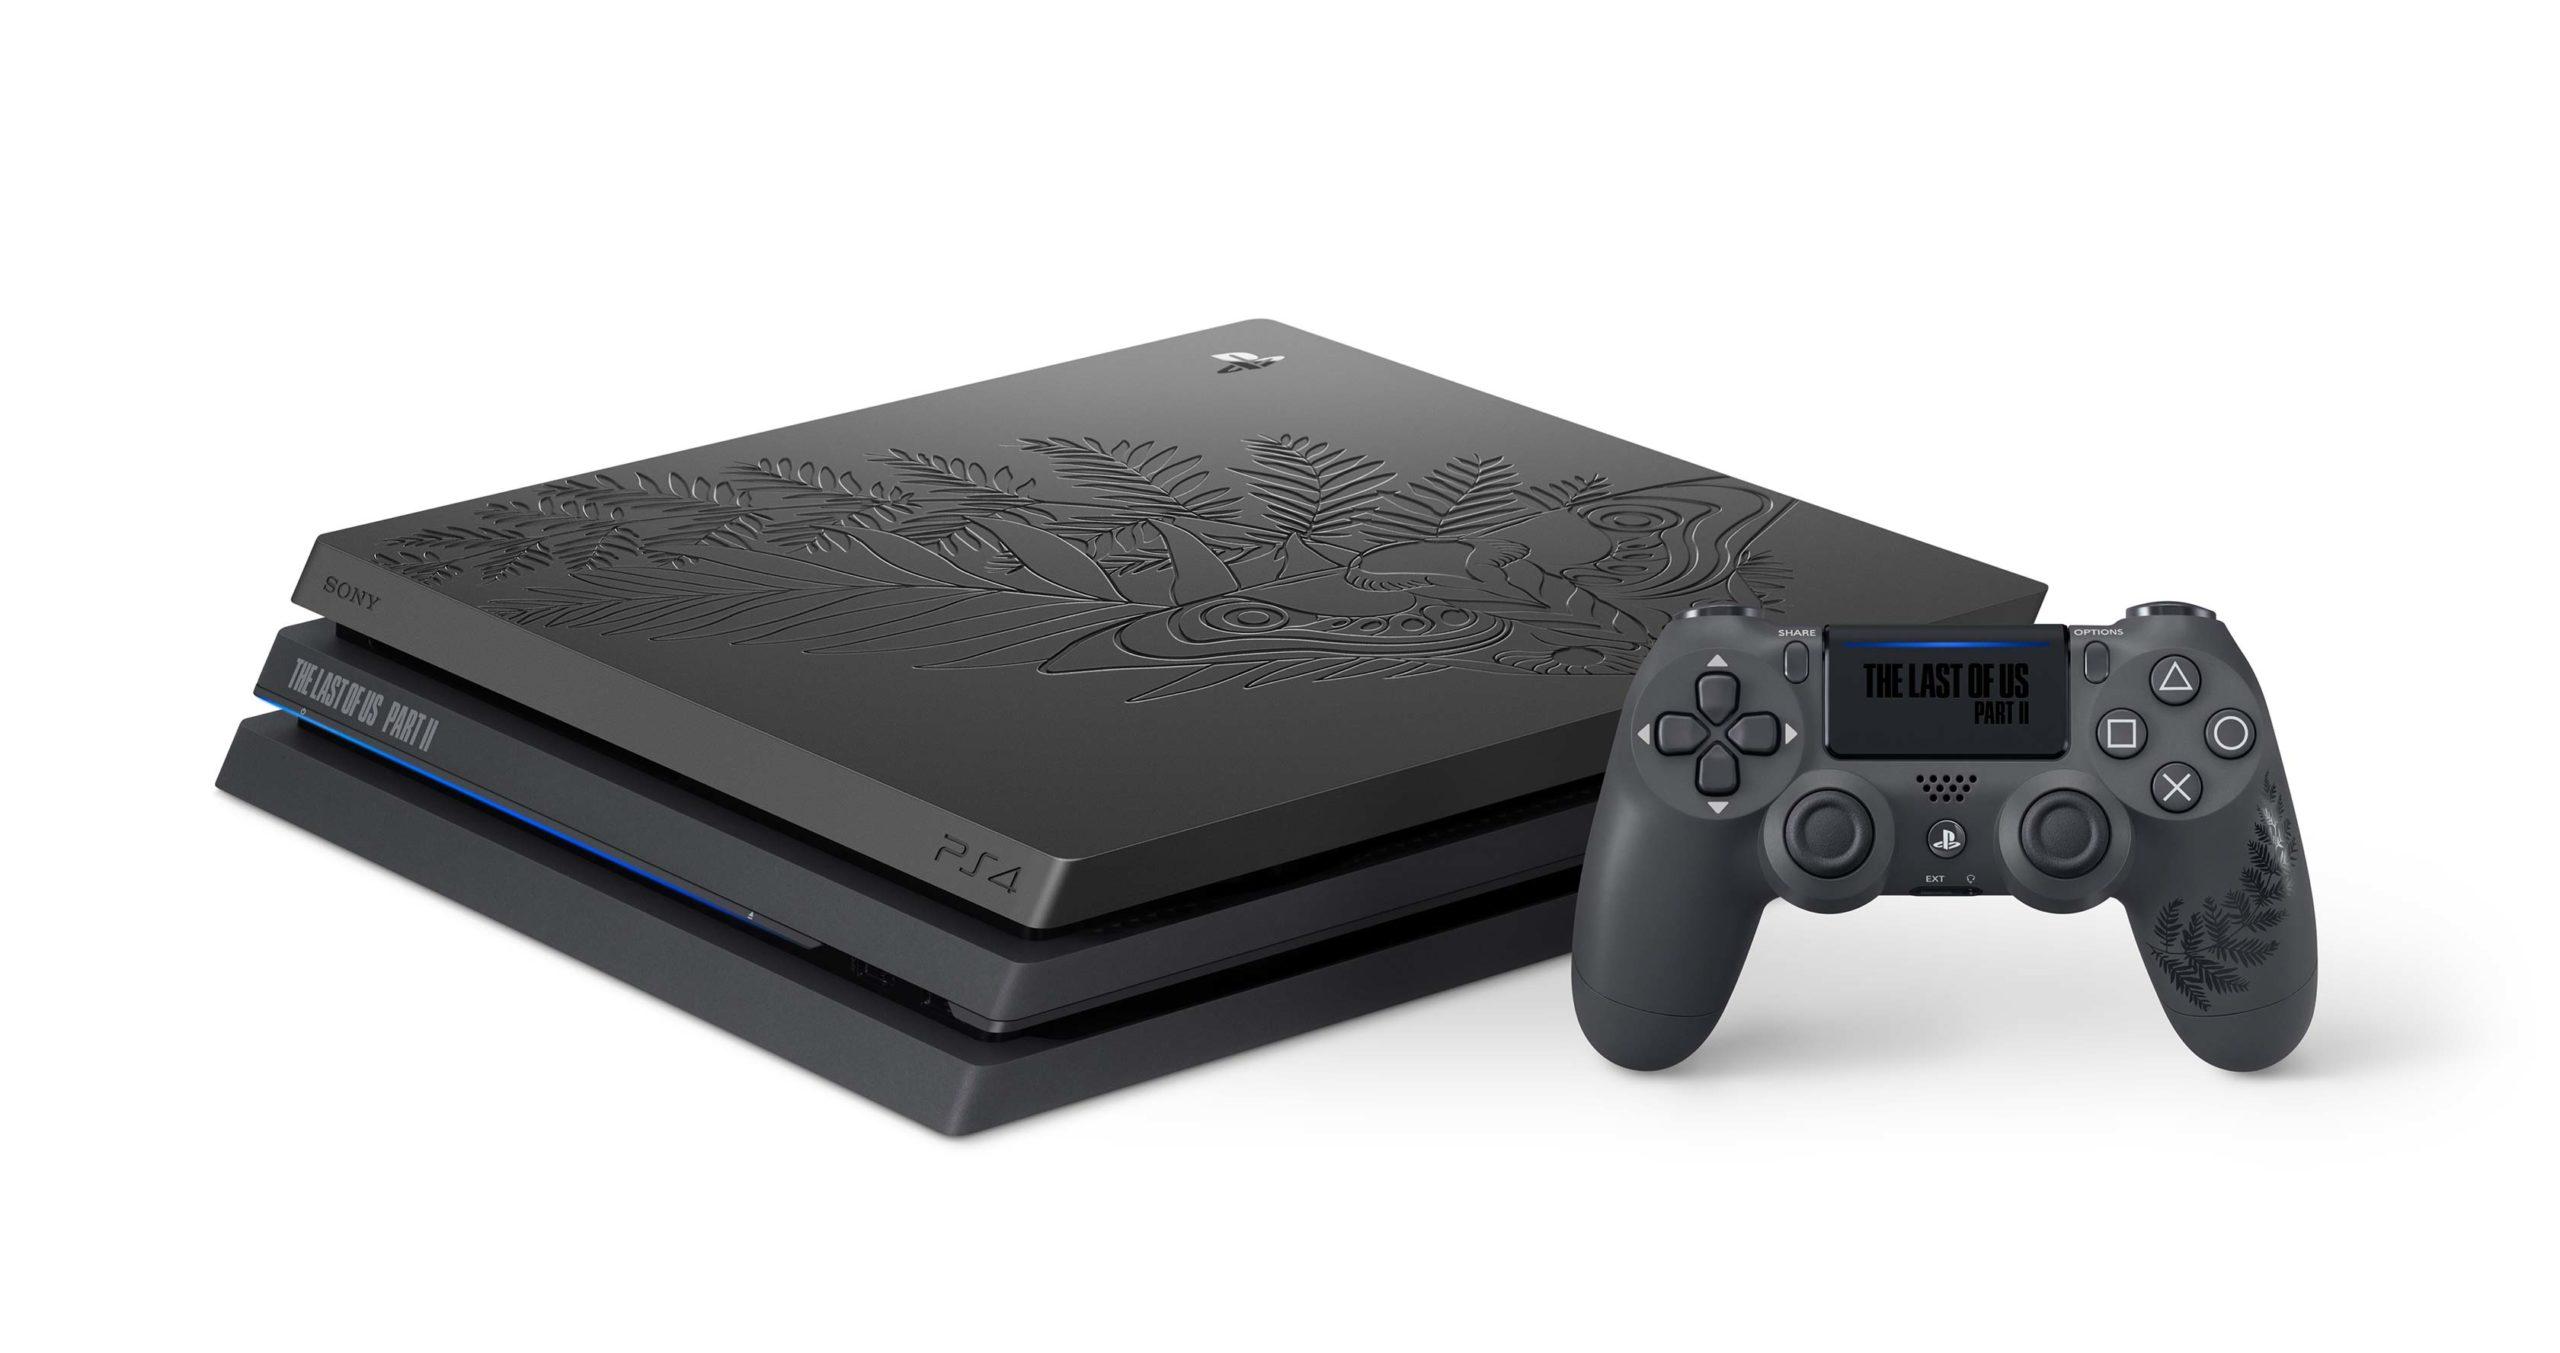 The Last of Us Part II PS4 bundle